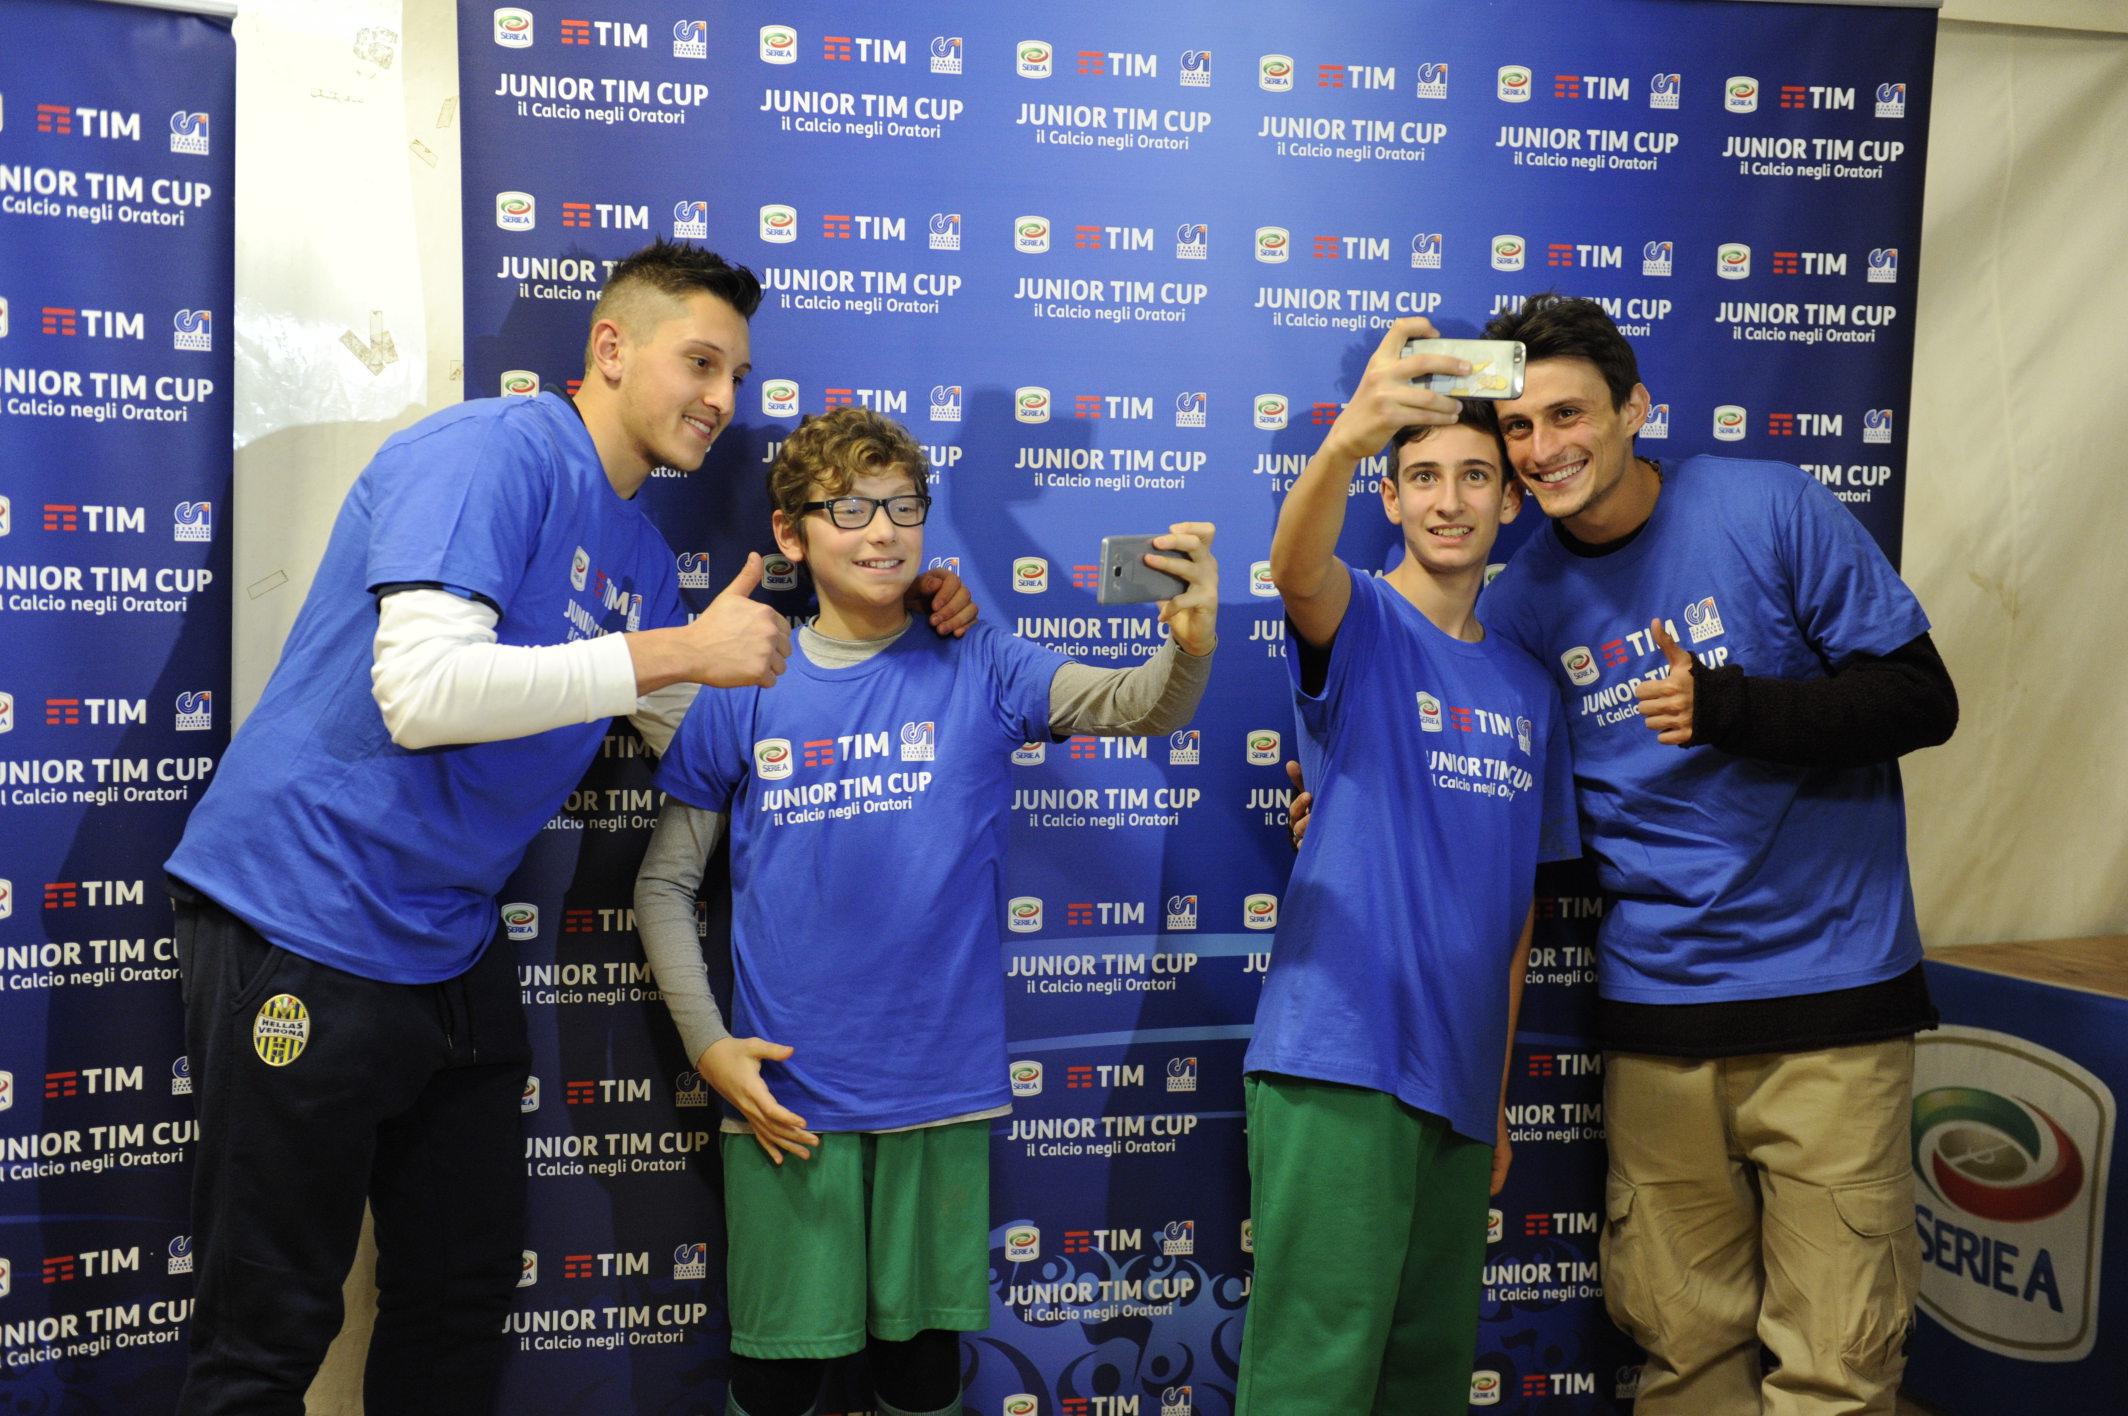 Junior TIM Cup Verona 2